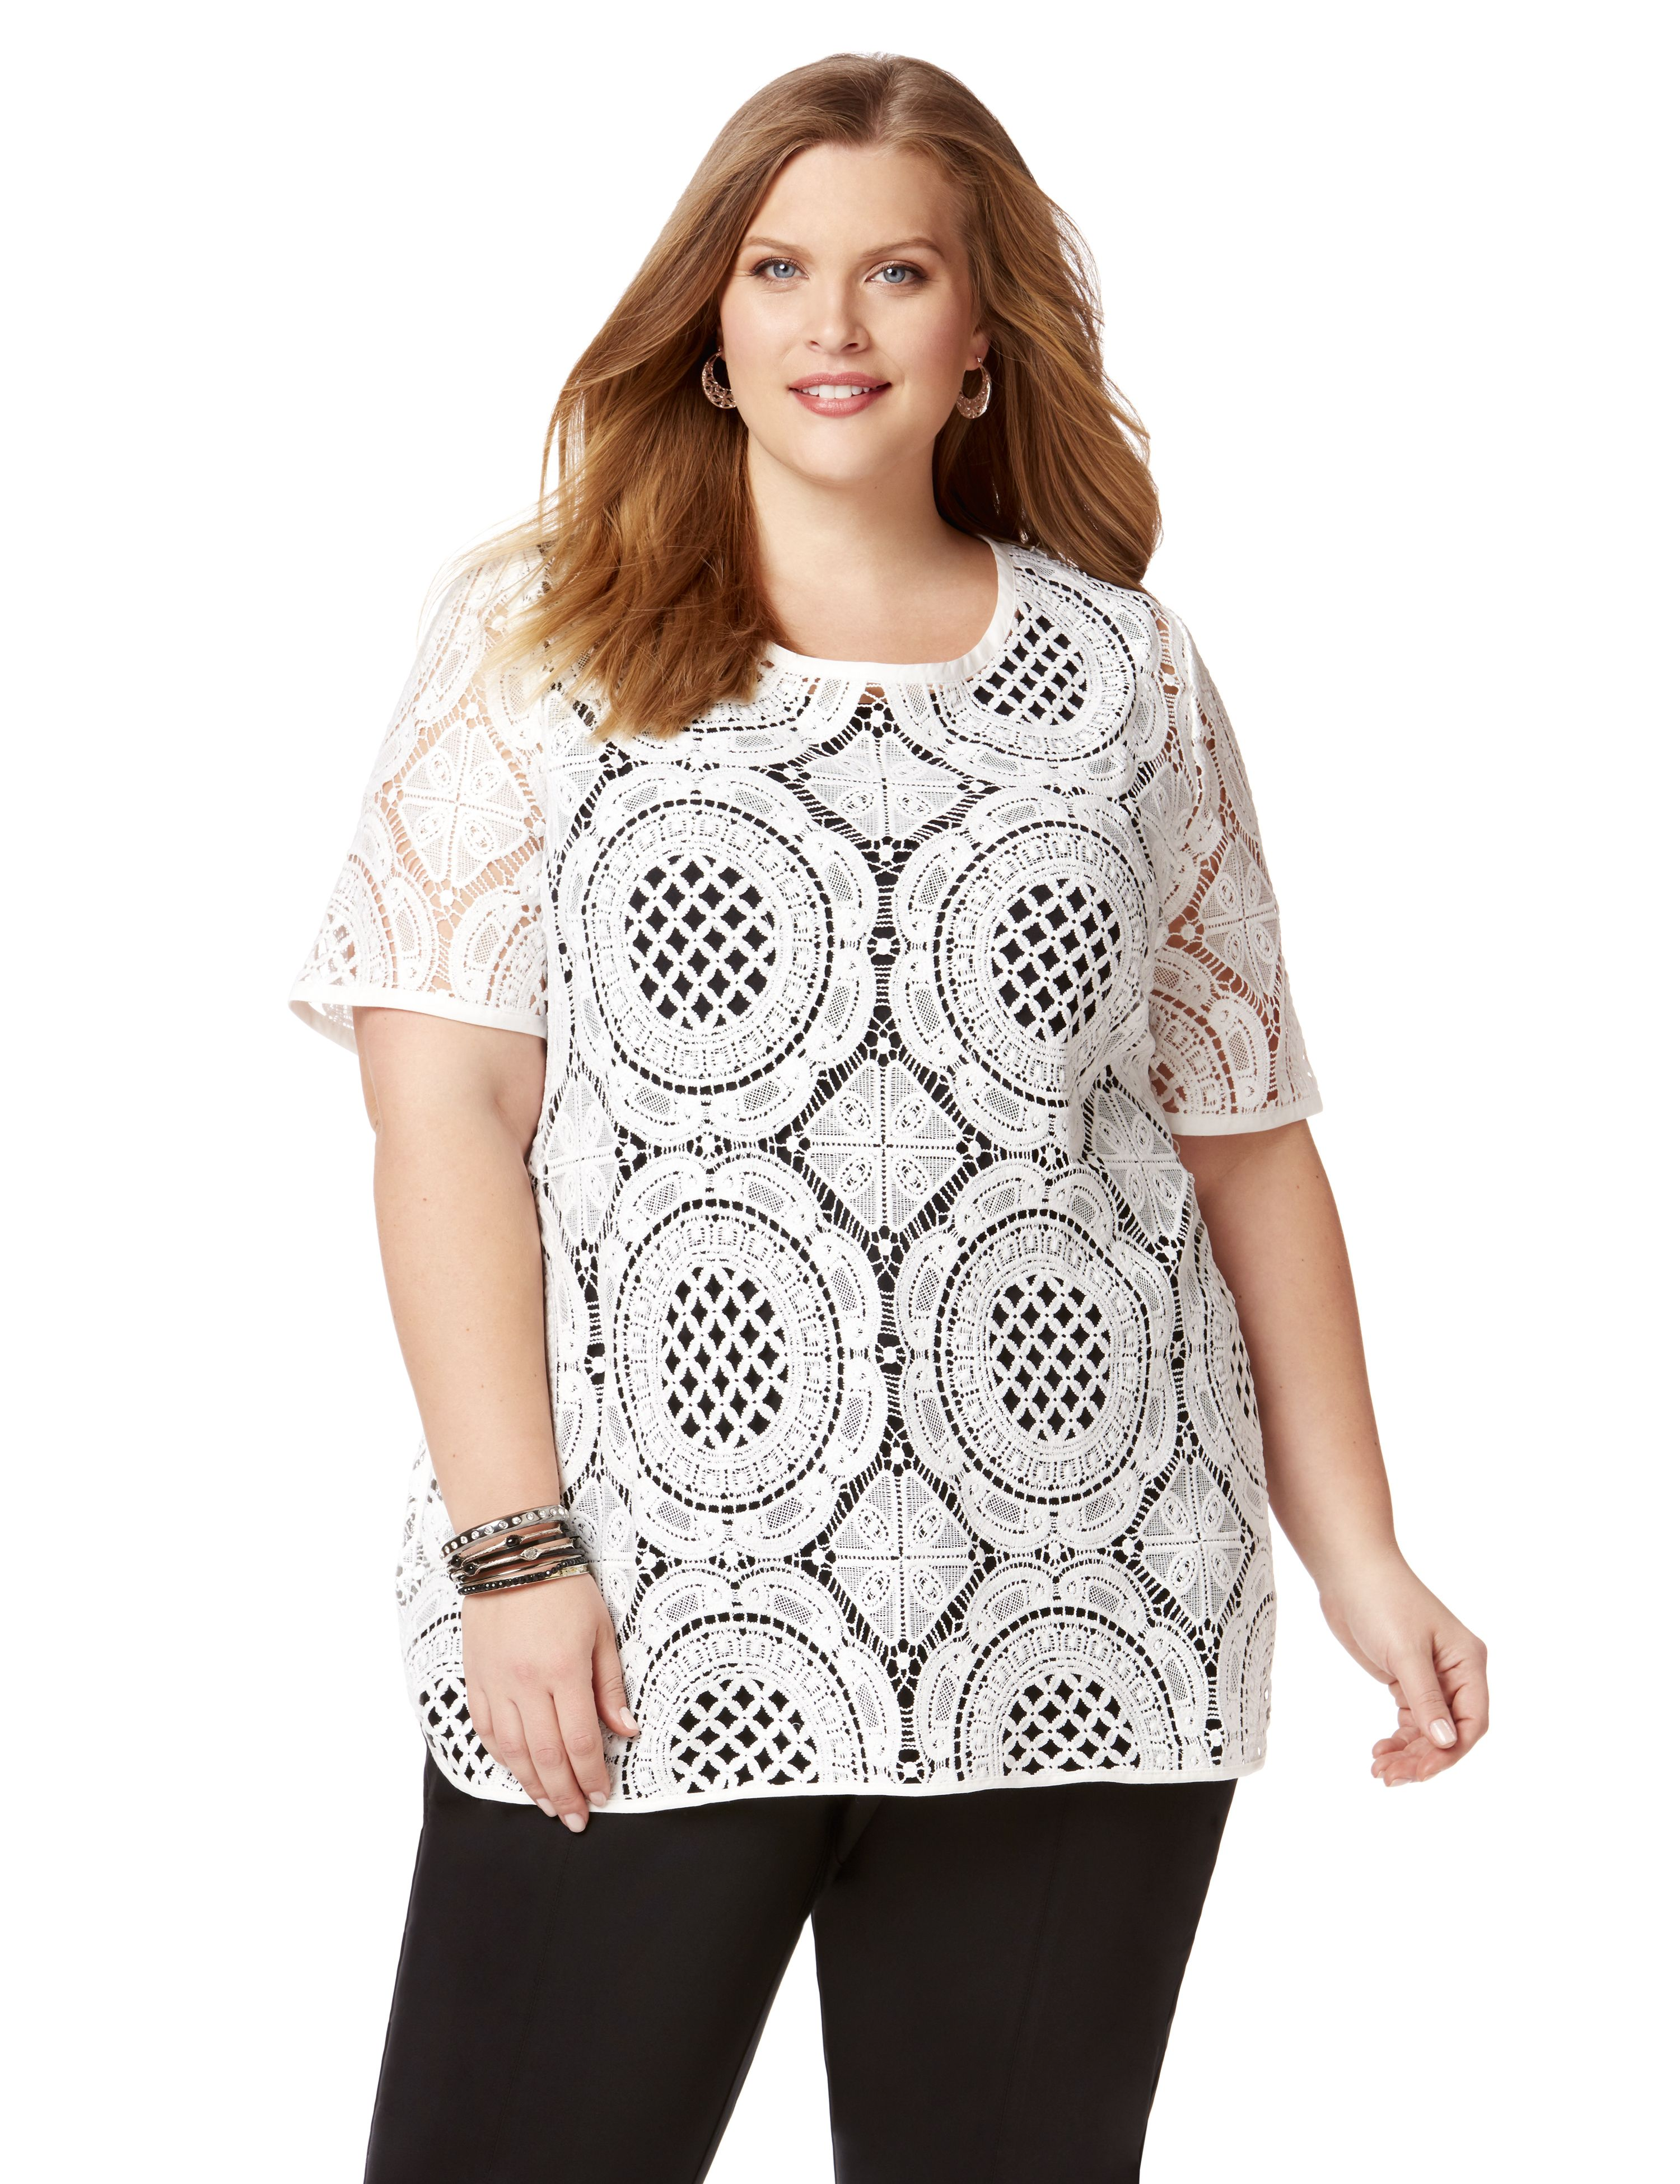 Las Palmas Crochet Top 300068685